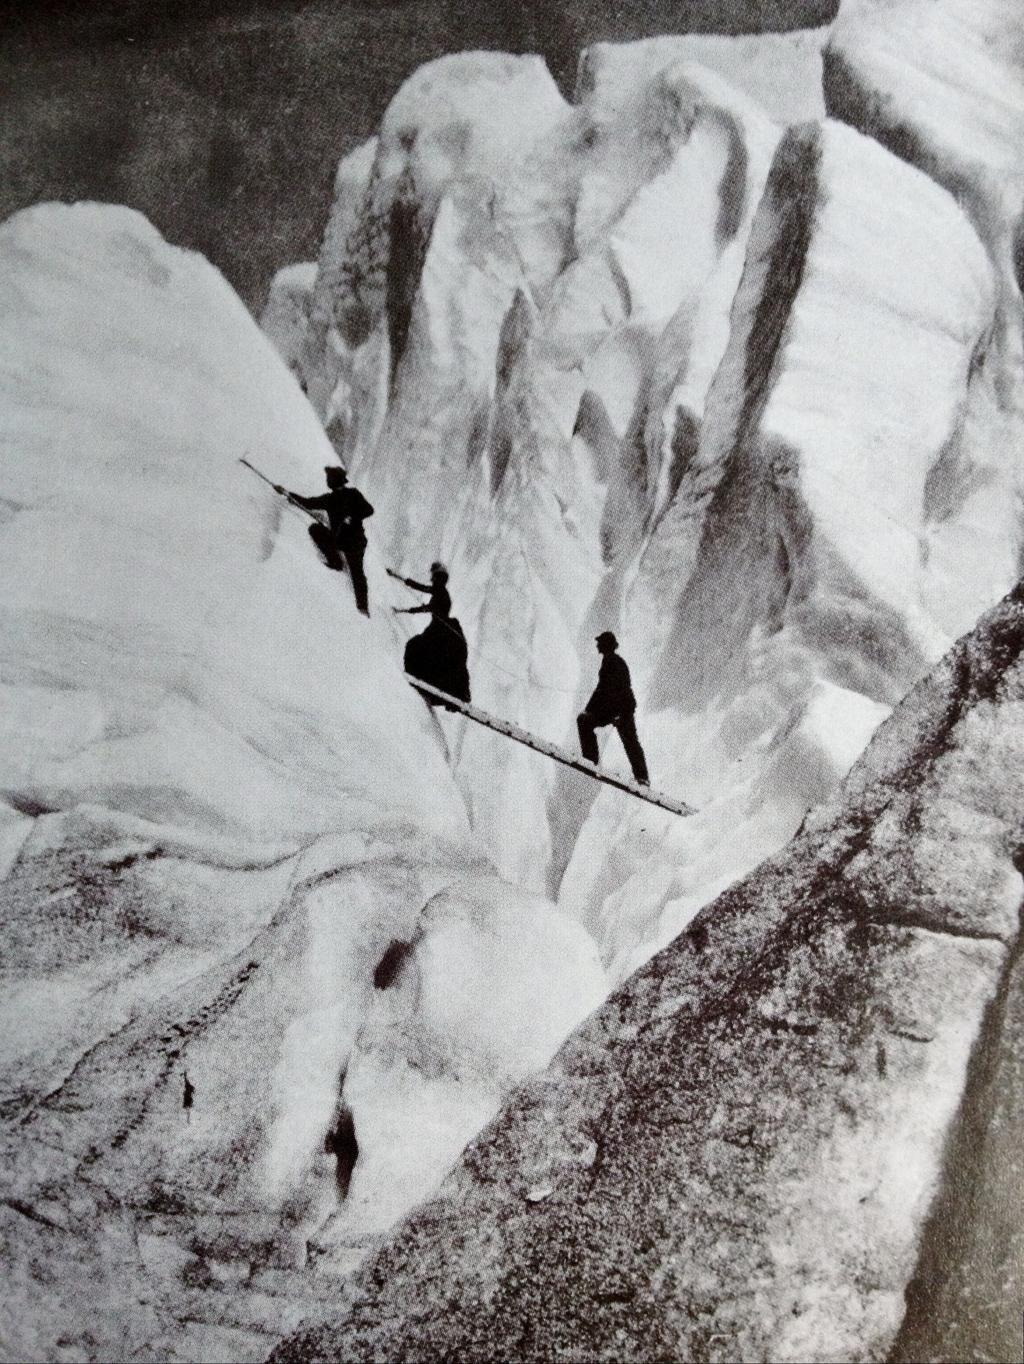 Vintagephotos On Twitter Weird Vintage Alps History Lover [ 1364 x 1024 Pixel ]